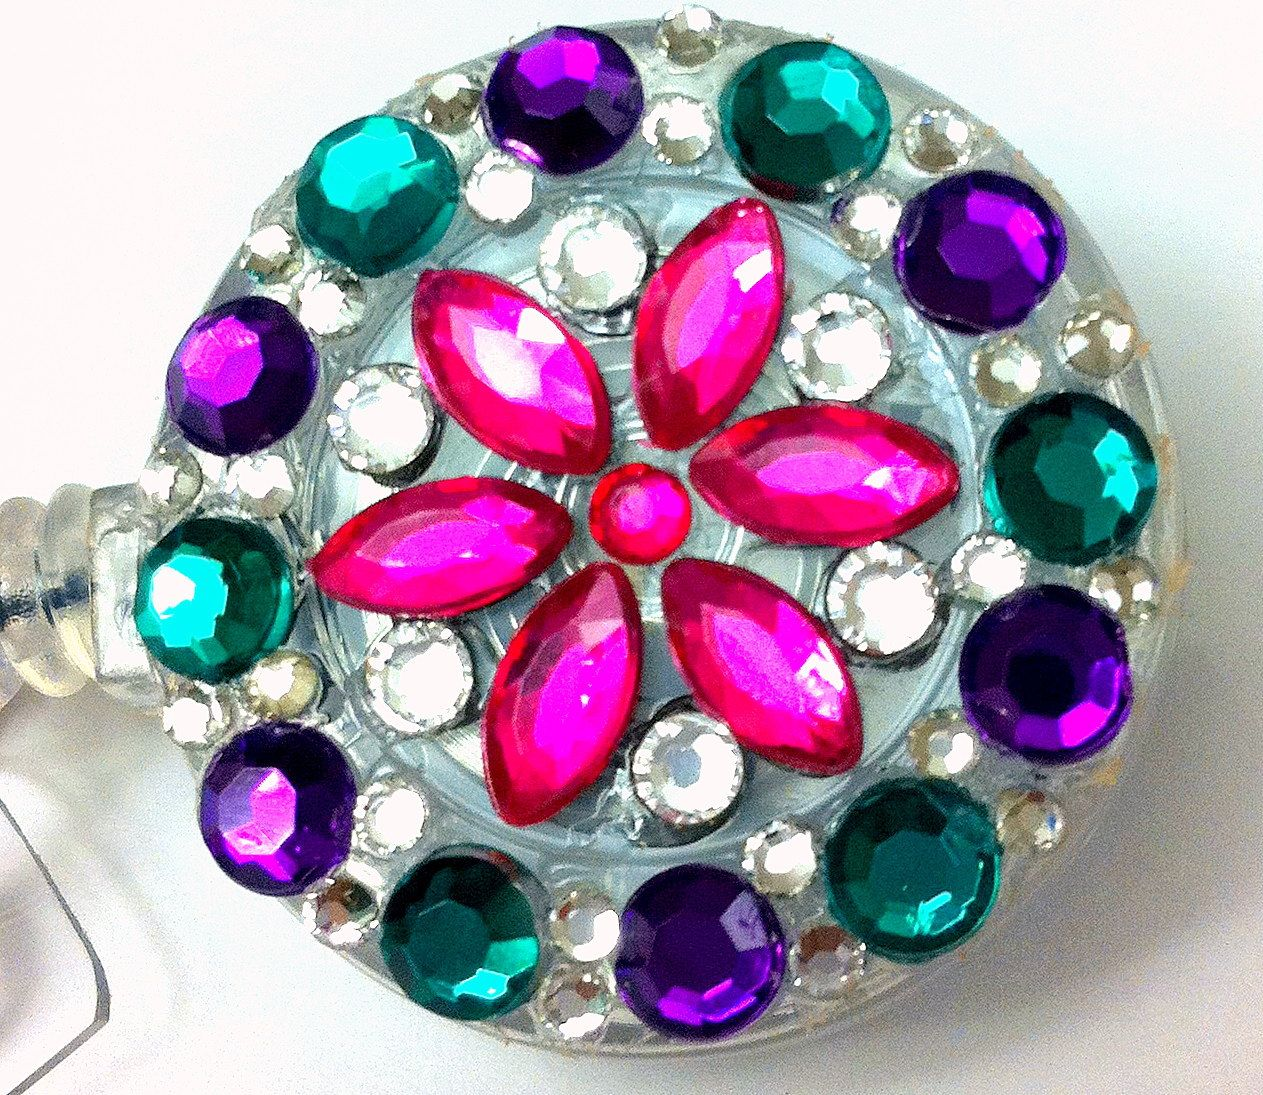 Pink and Multi-Colored Swarovski Crystal & Rhinestone Flower Embellished Retractable Name Tag ID Badge Reel